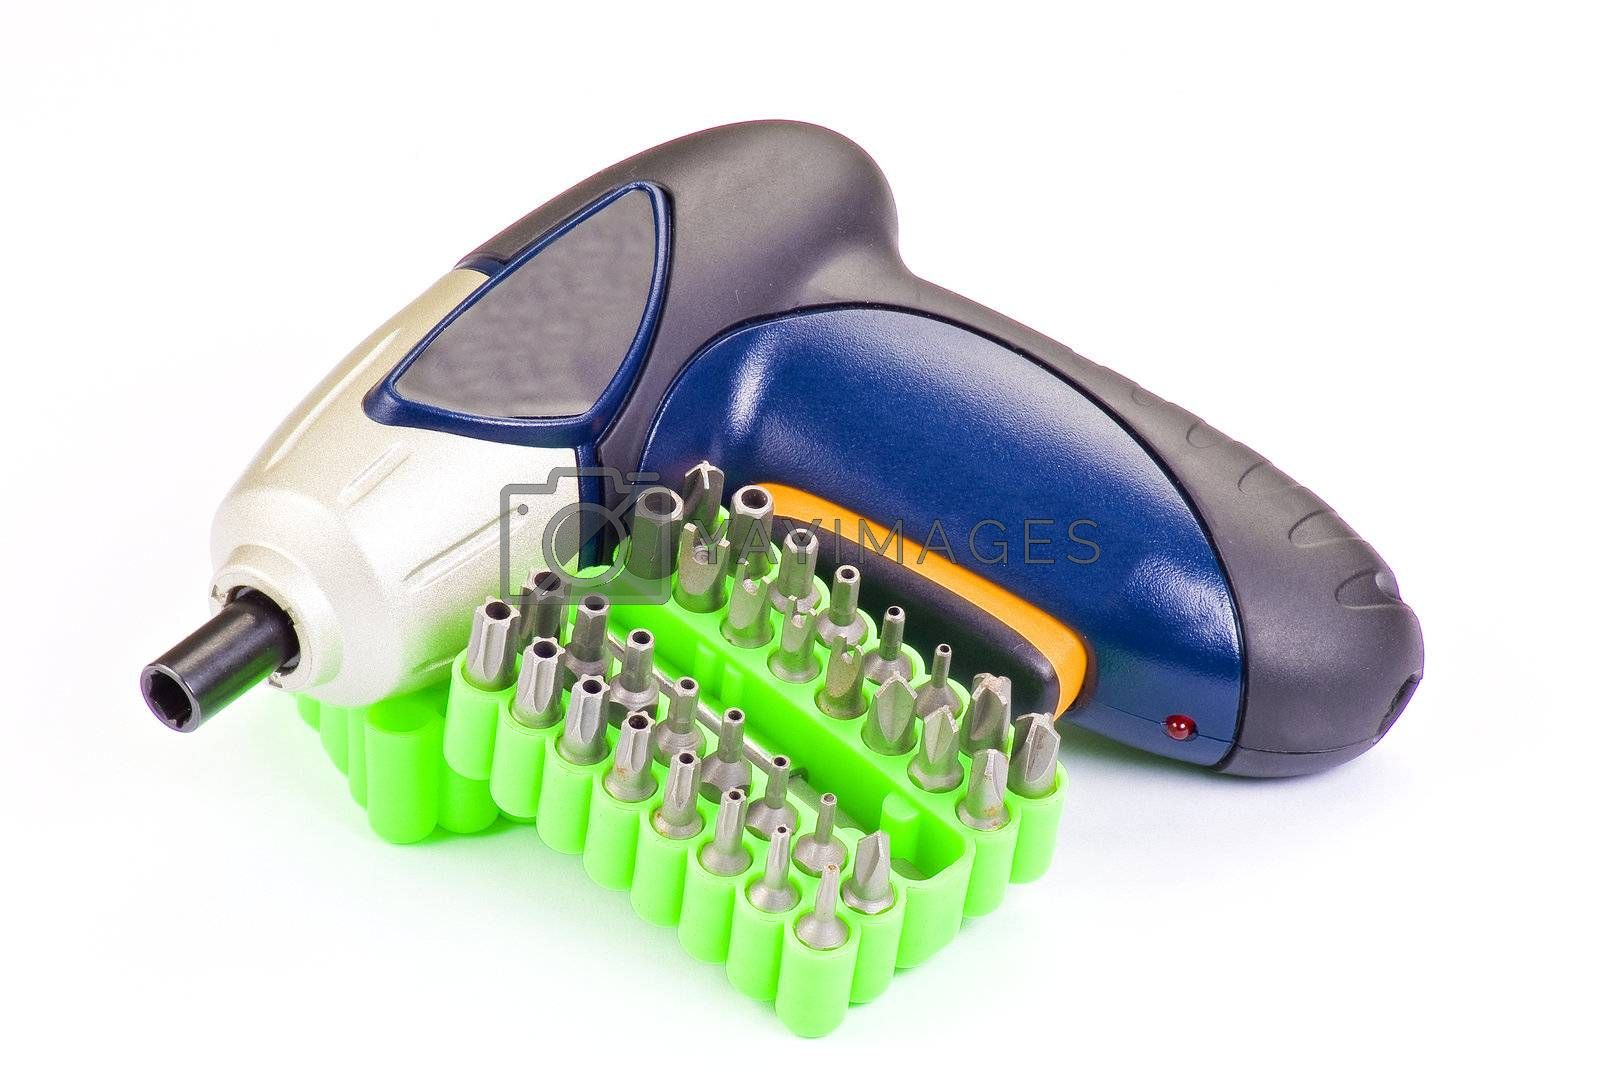 Screwdriver tool kit by caldix